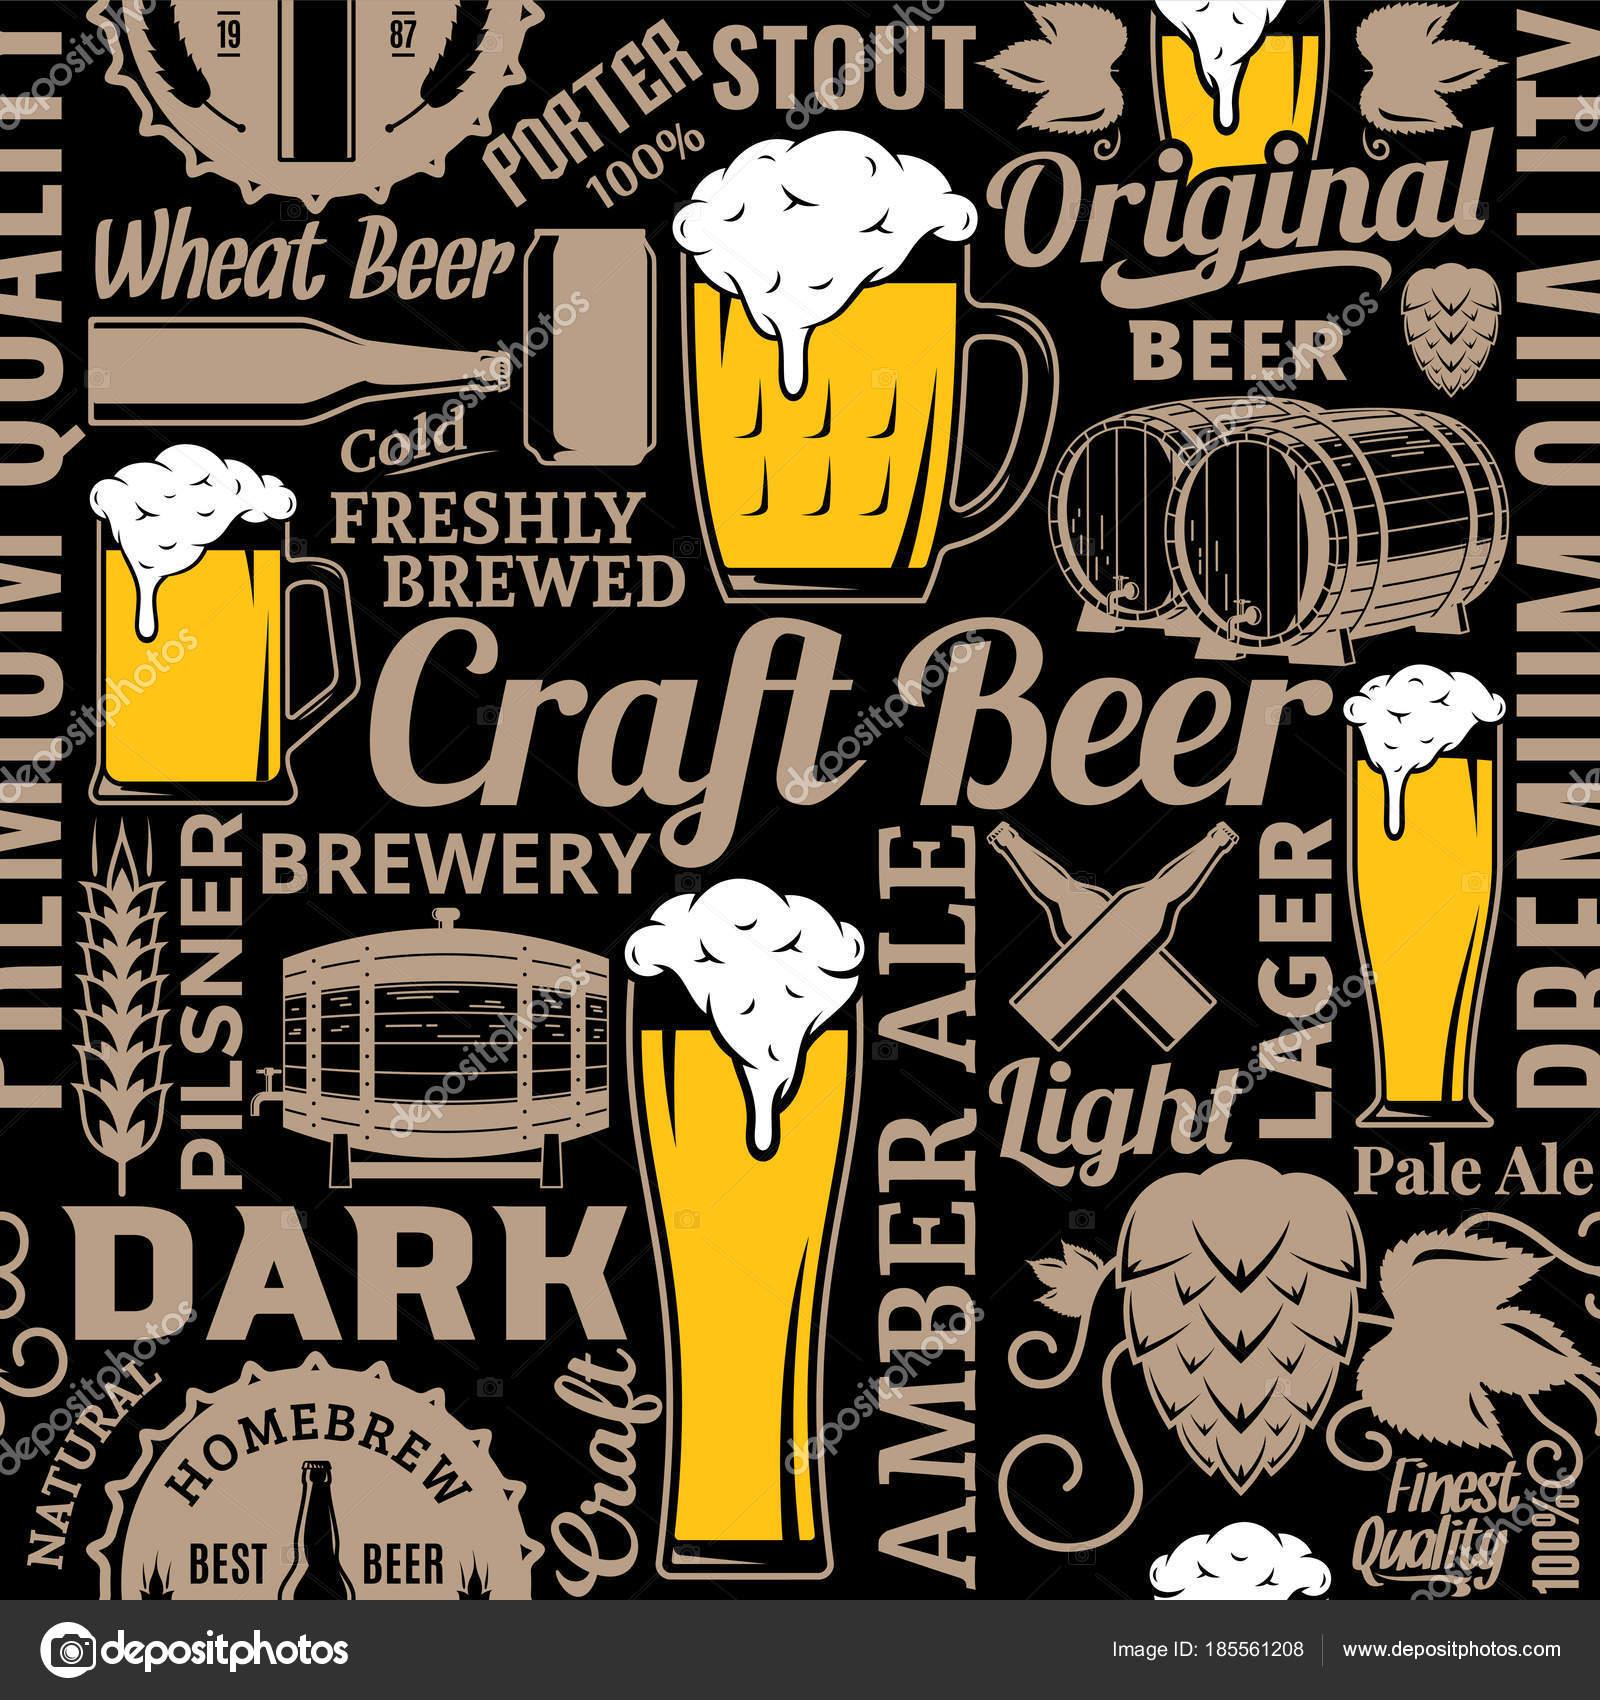 Beer Mug Clip Art, Modelo Beer, Beer Can, Beer Bottle Vector, Beer Glass,  Beer #380313 - Free Icon Library